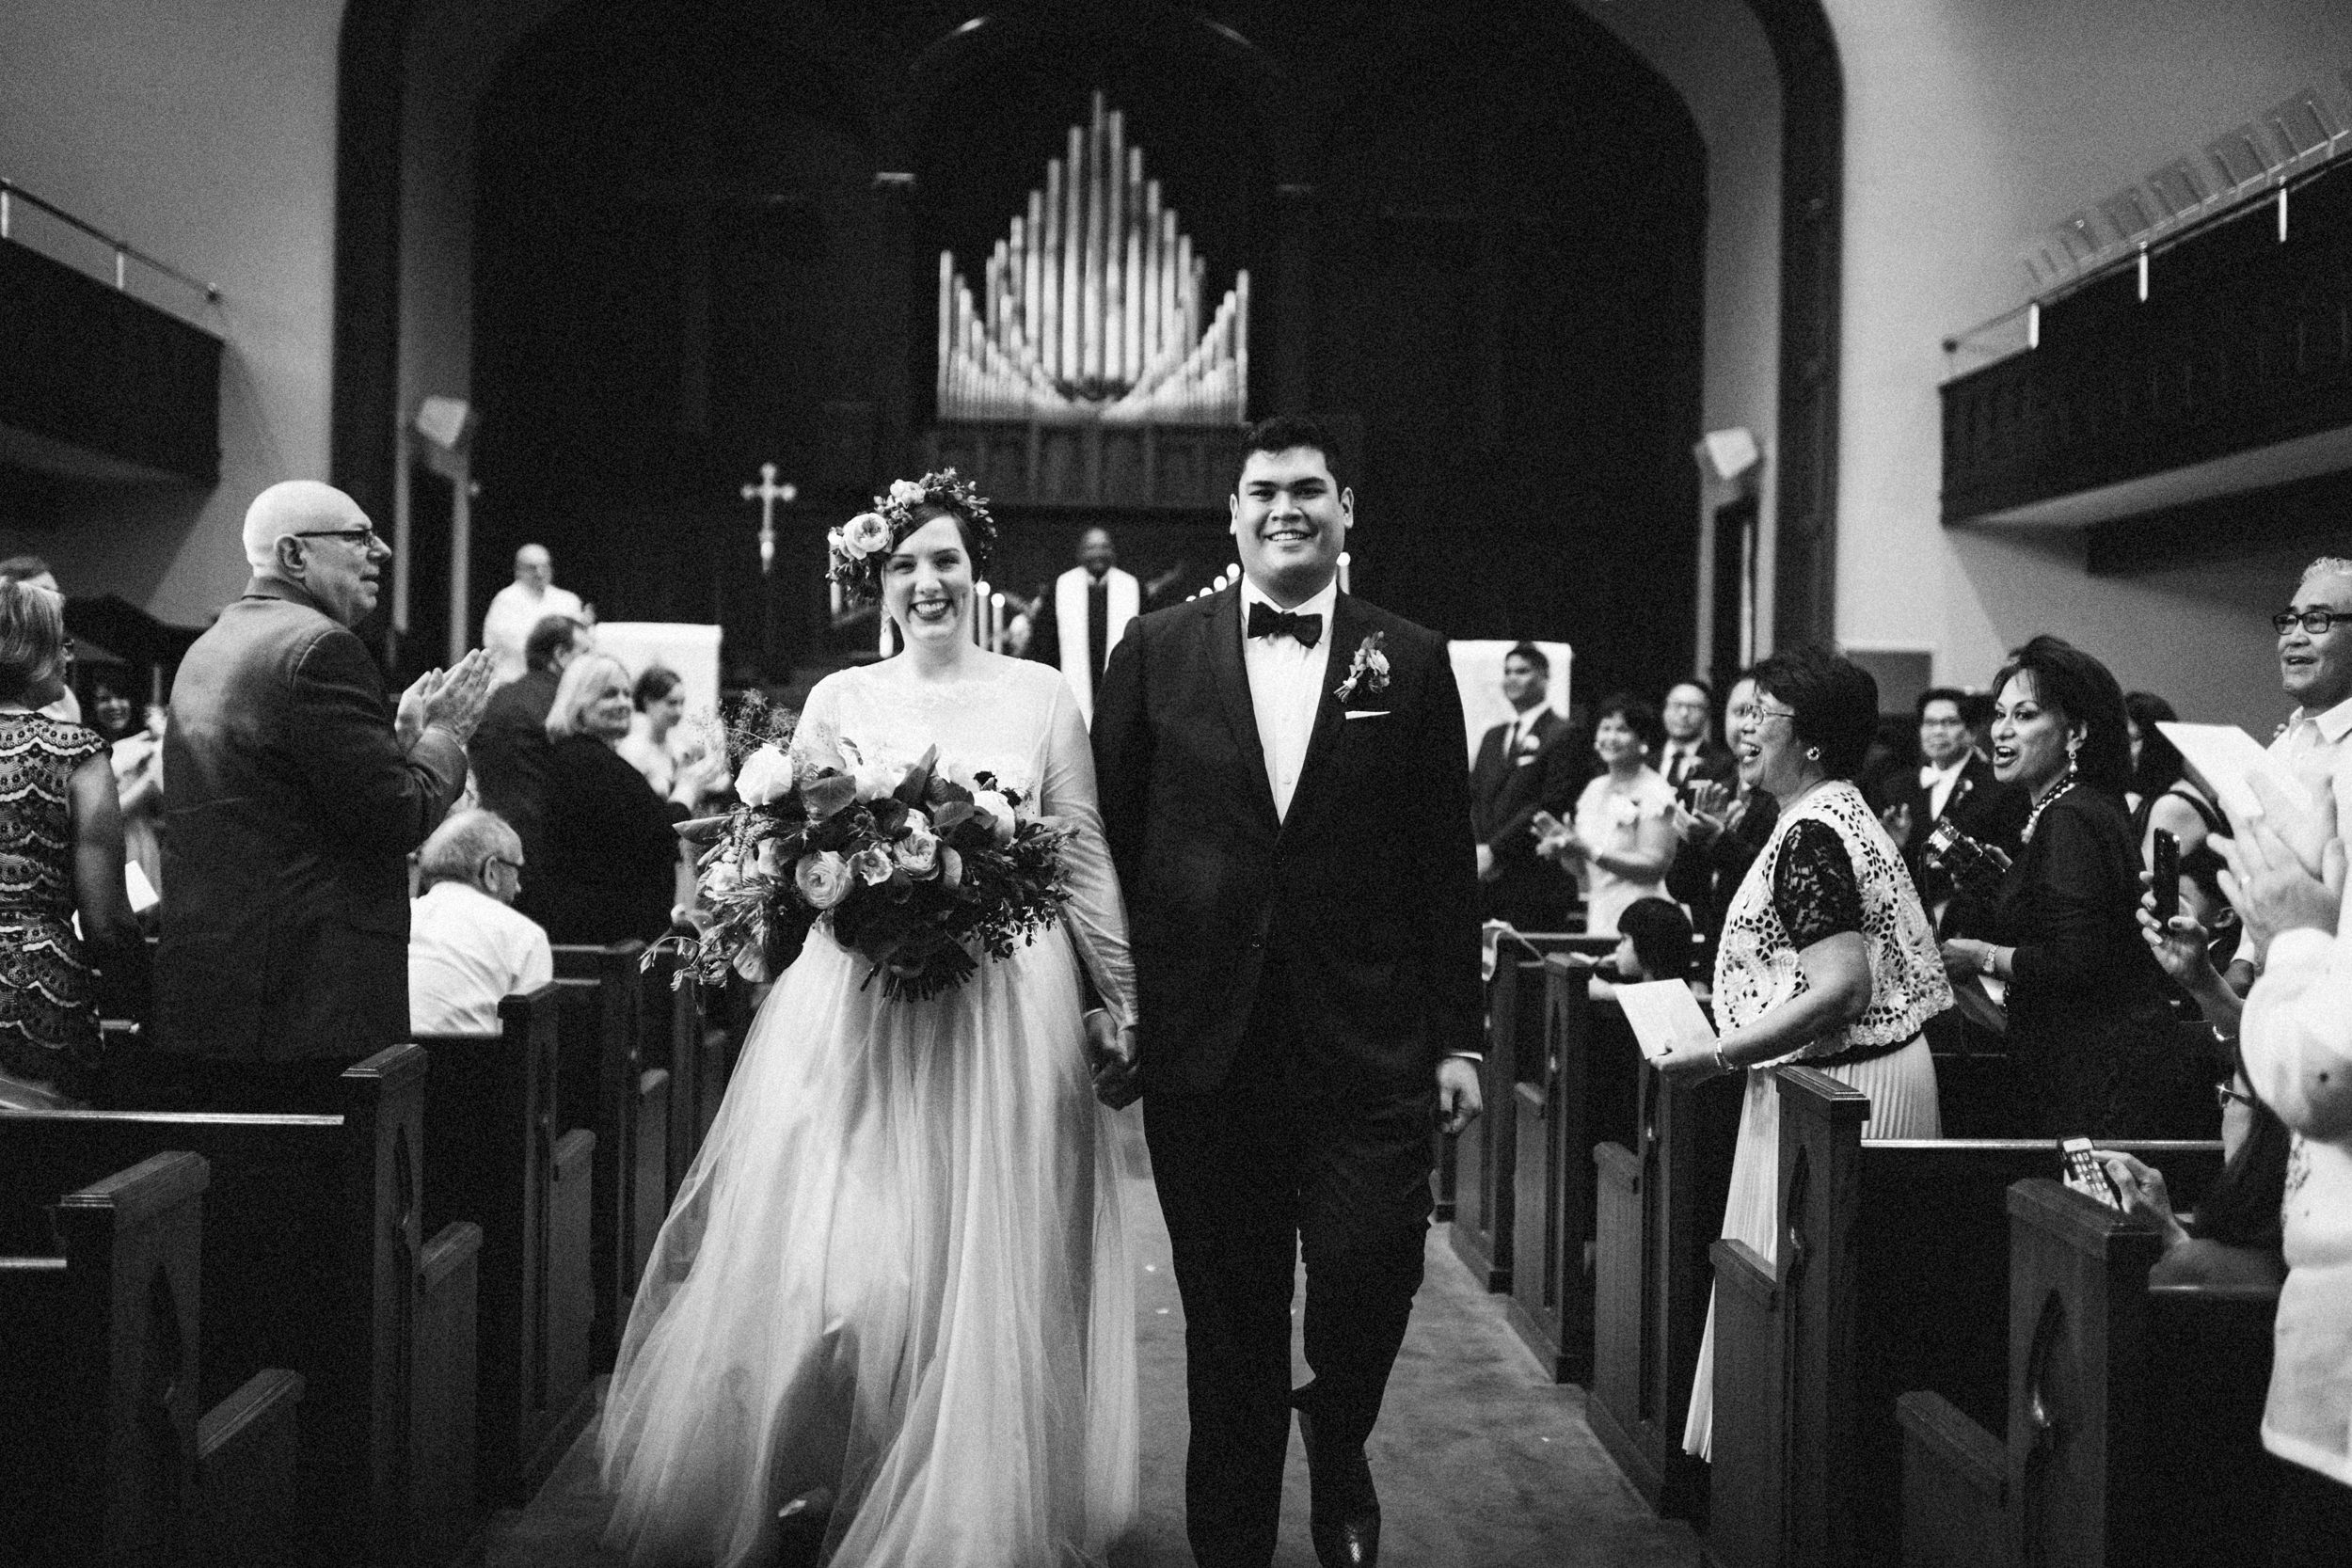 lauren-dean-wedding-grand-lodge-kentucky-sarah-katherine-davis-photography-412bw.jpg